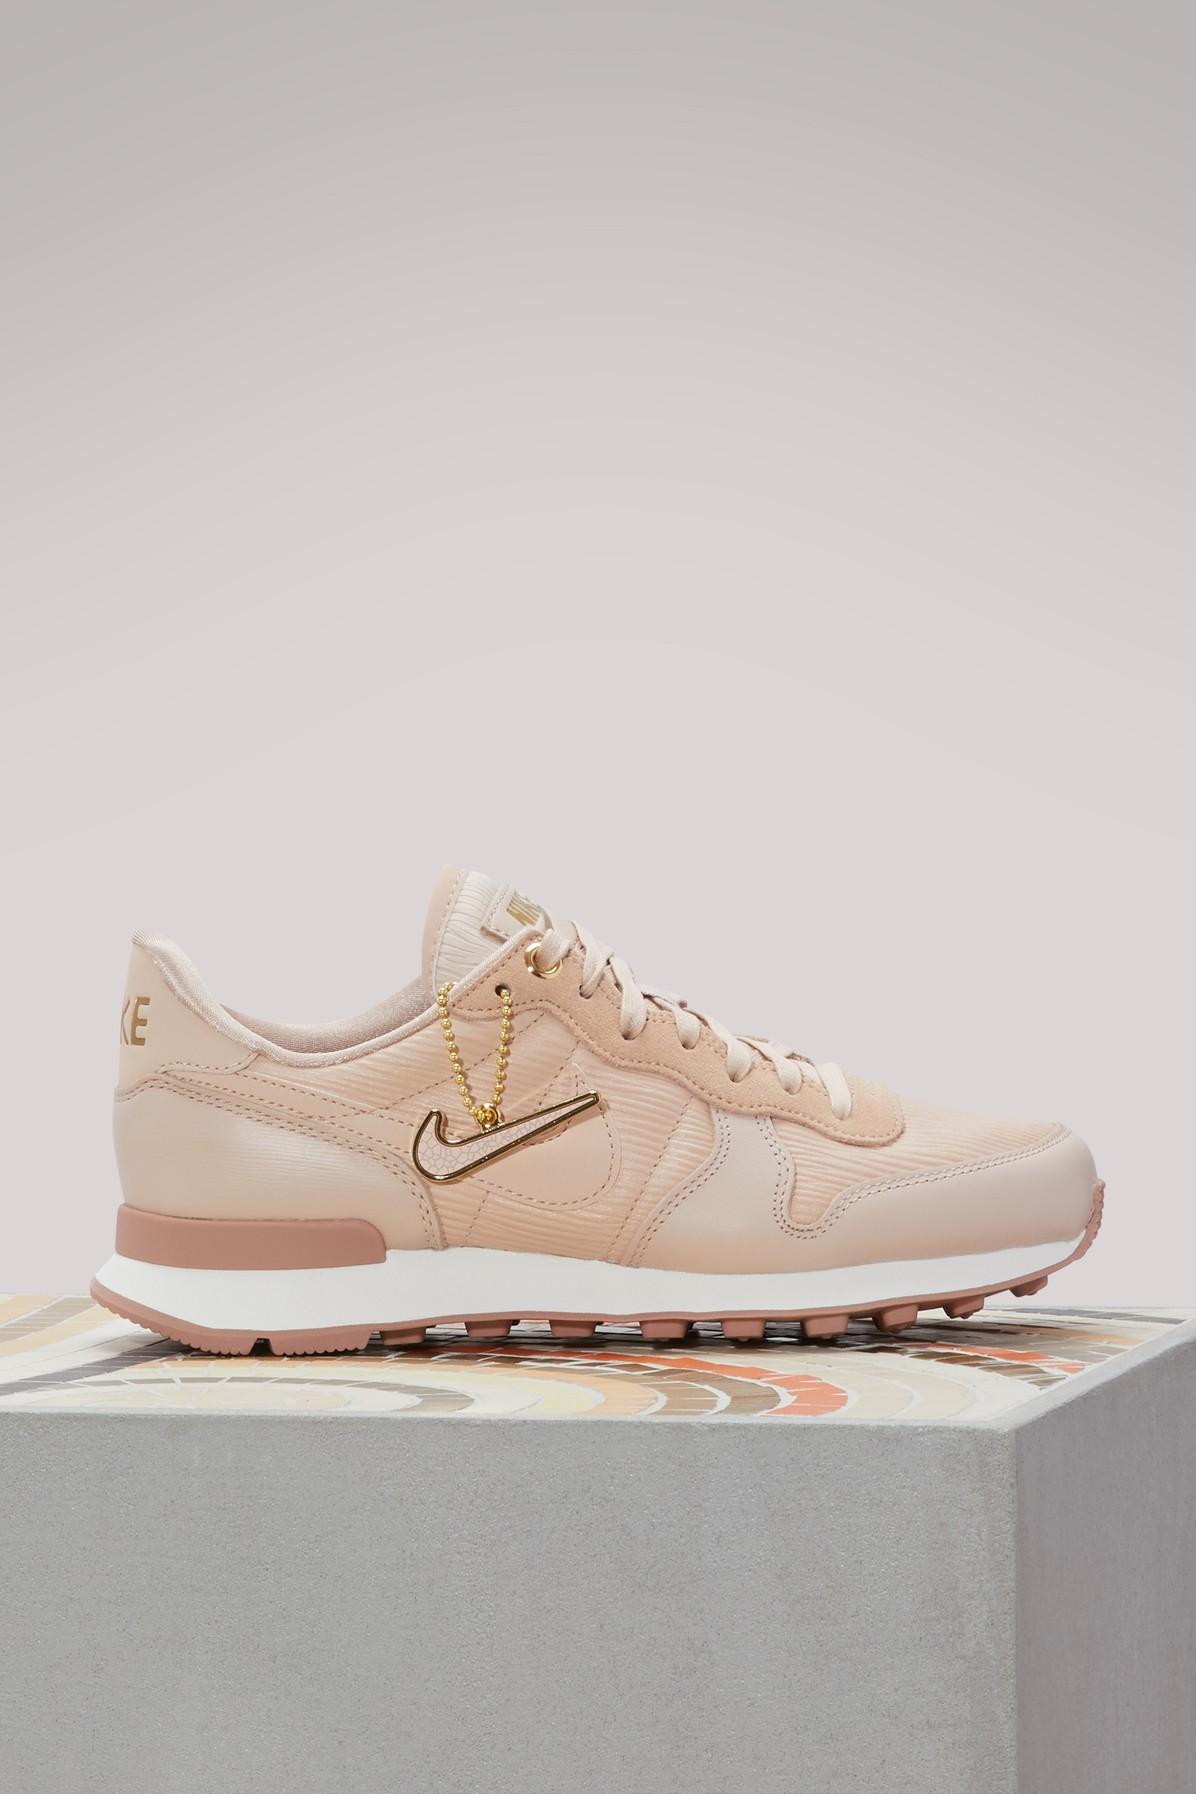 on sale 9ee02 a2cb7 Nike Premium Internationalist Sneakers In Particle Beige Particle Beige